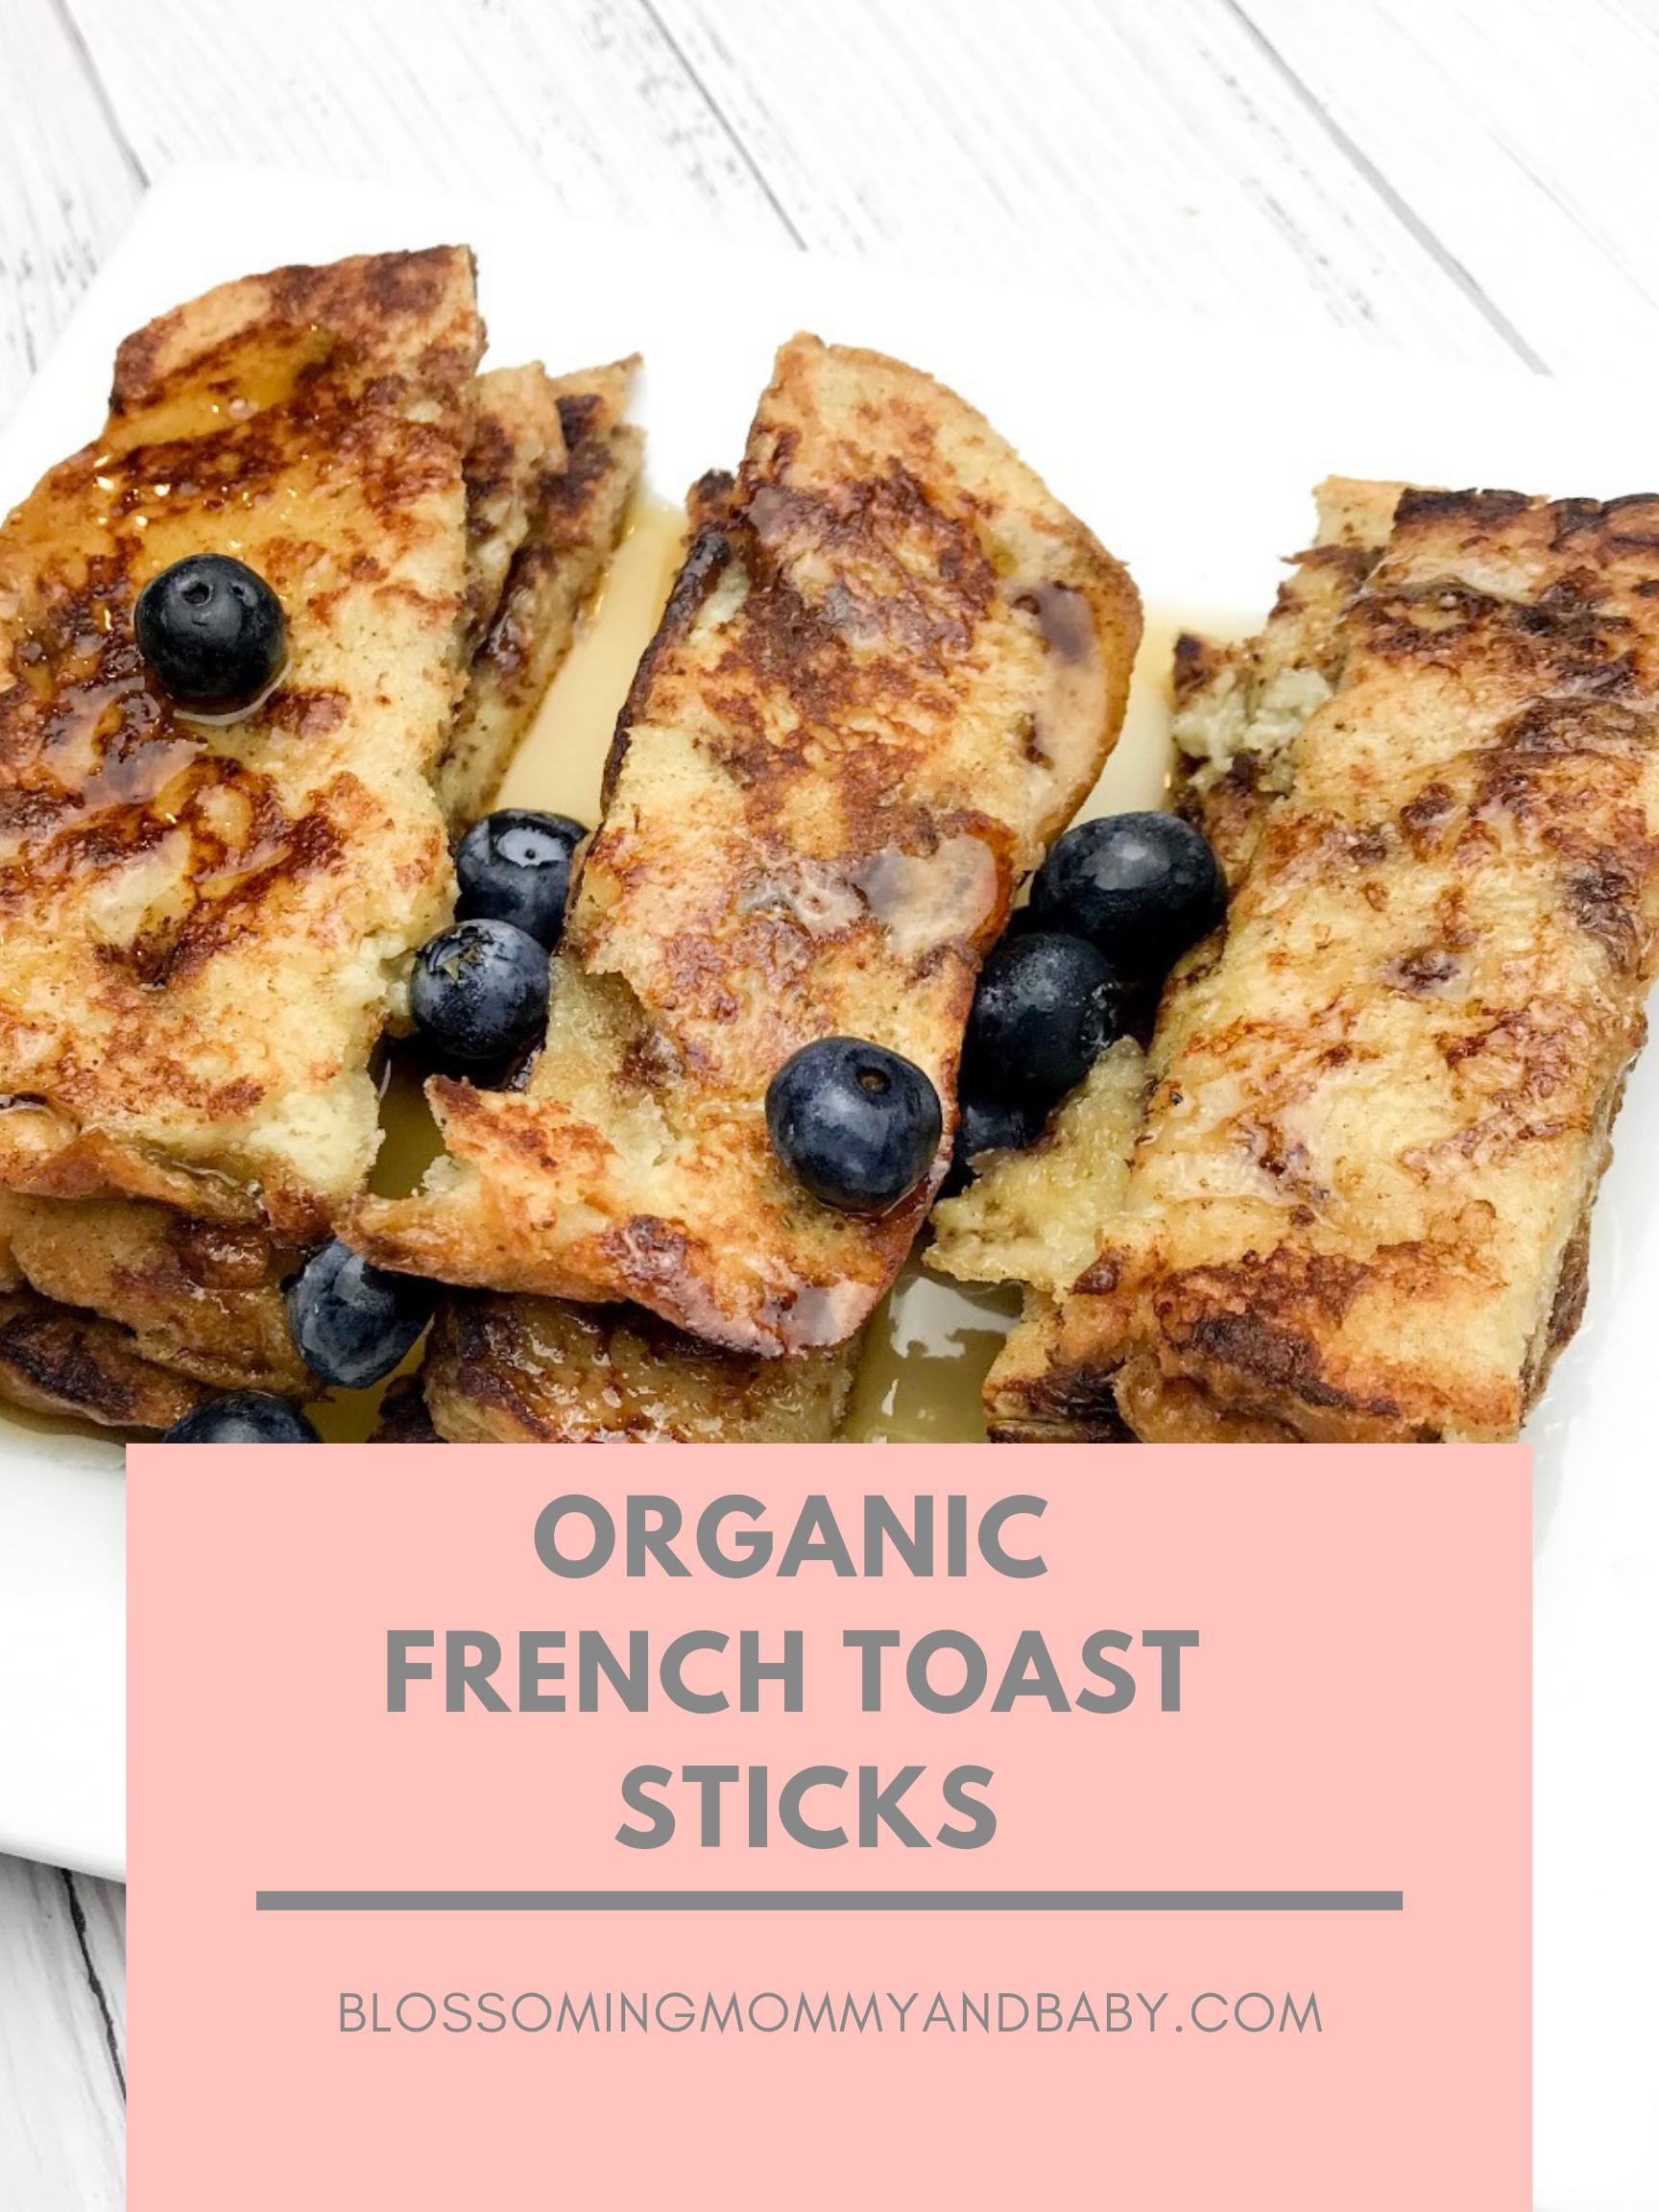 Organic Fench Toast Sticks